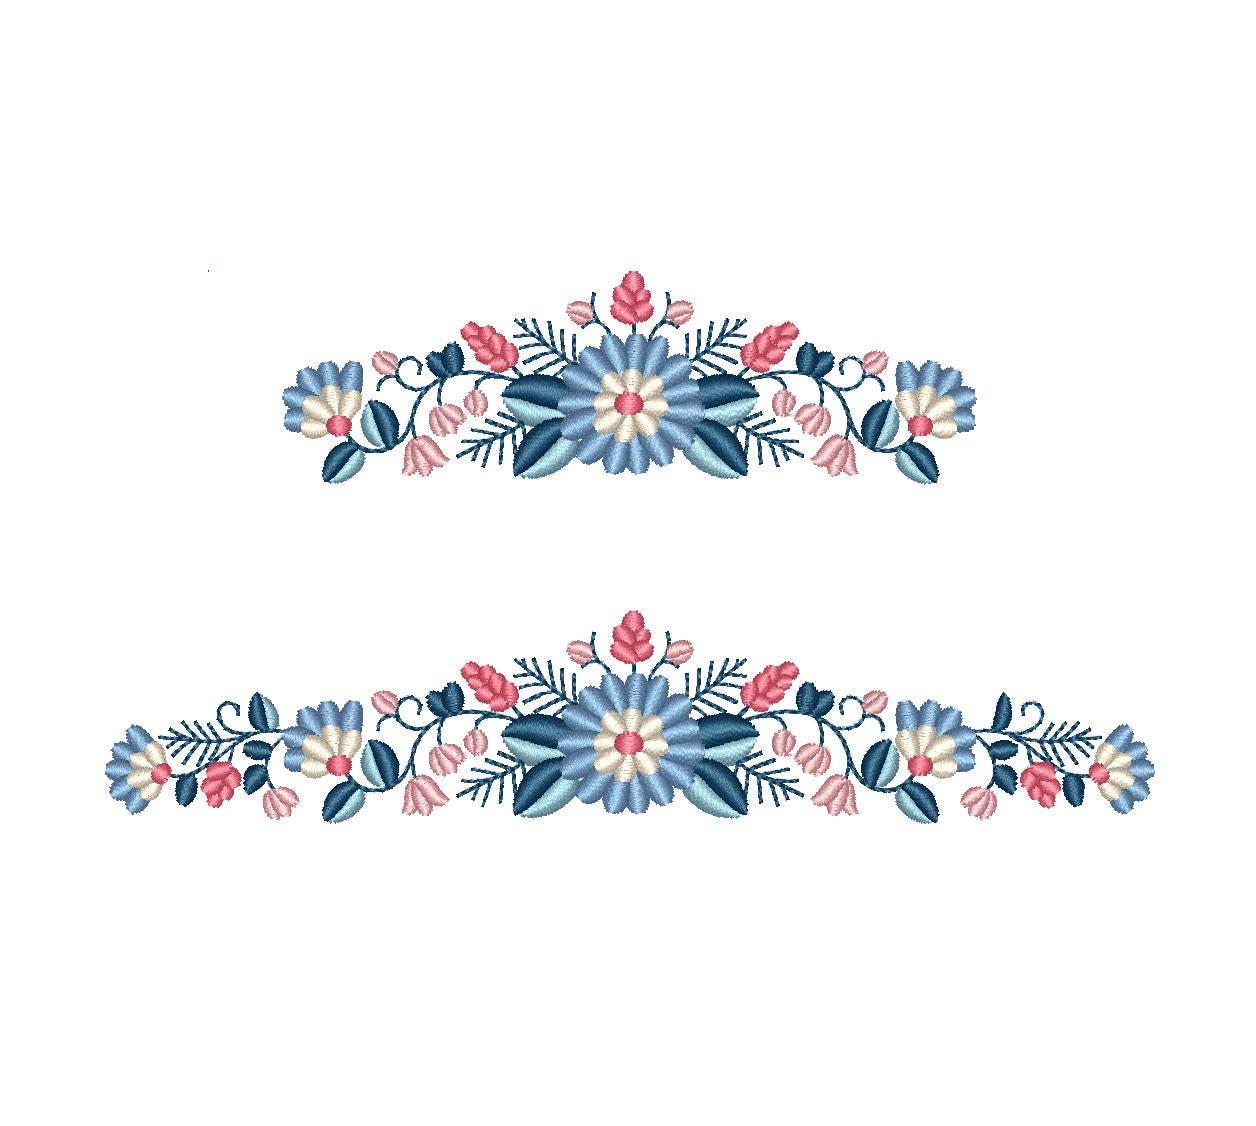 Folk Floral Border Machine Embroidery Design - Boho Flower Border Machine Embroidery File. 2 ...